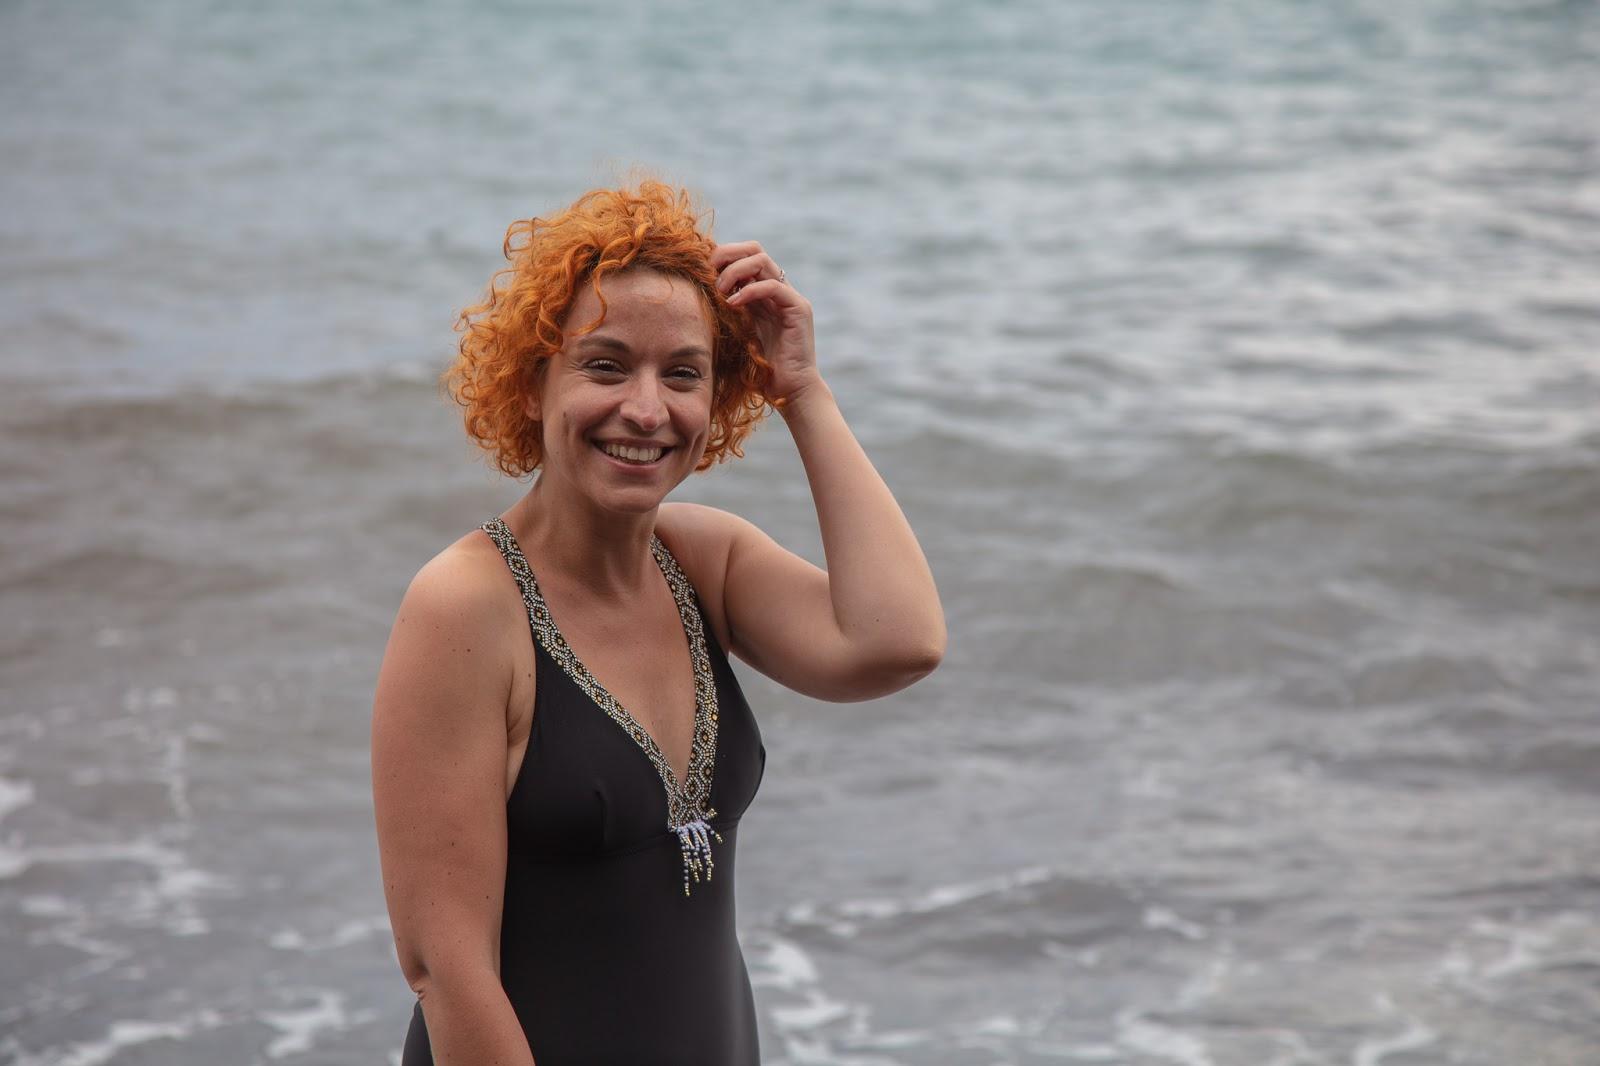 maillot-pomm-poire-red-beach-santorin